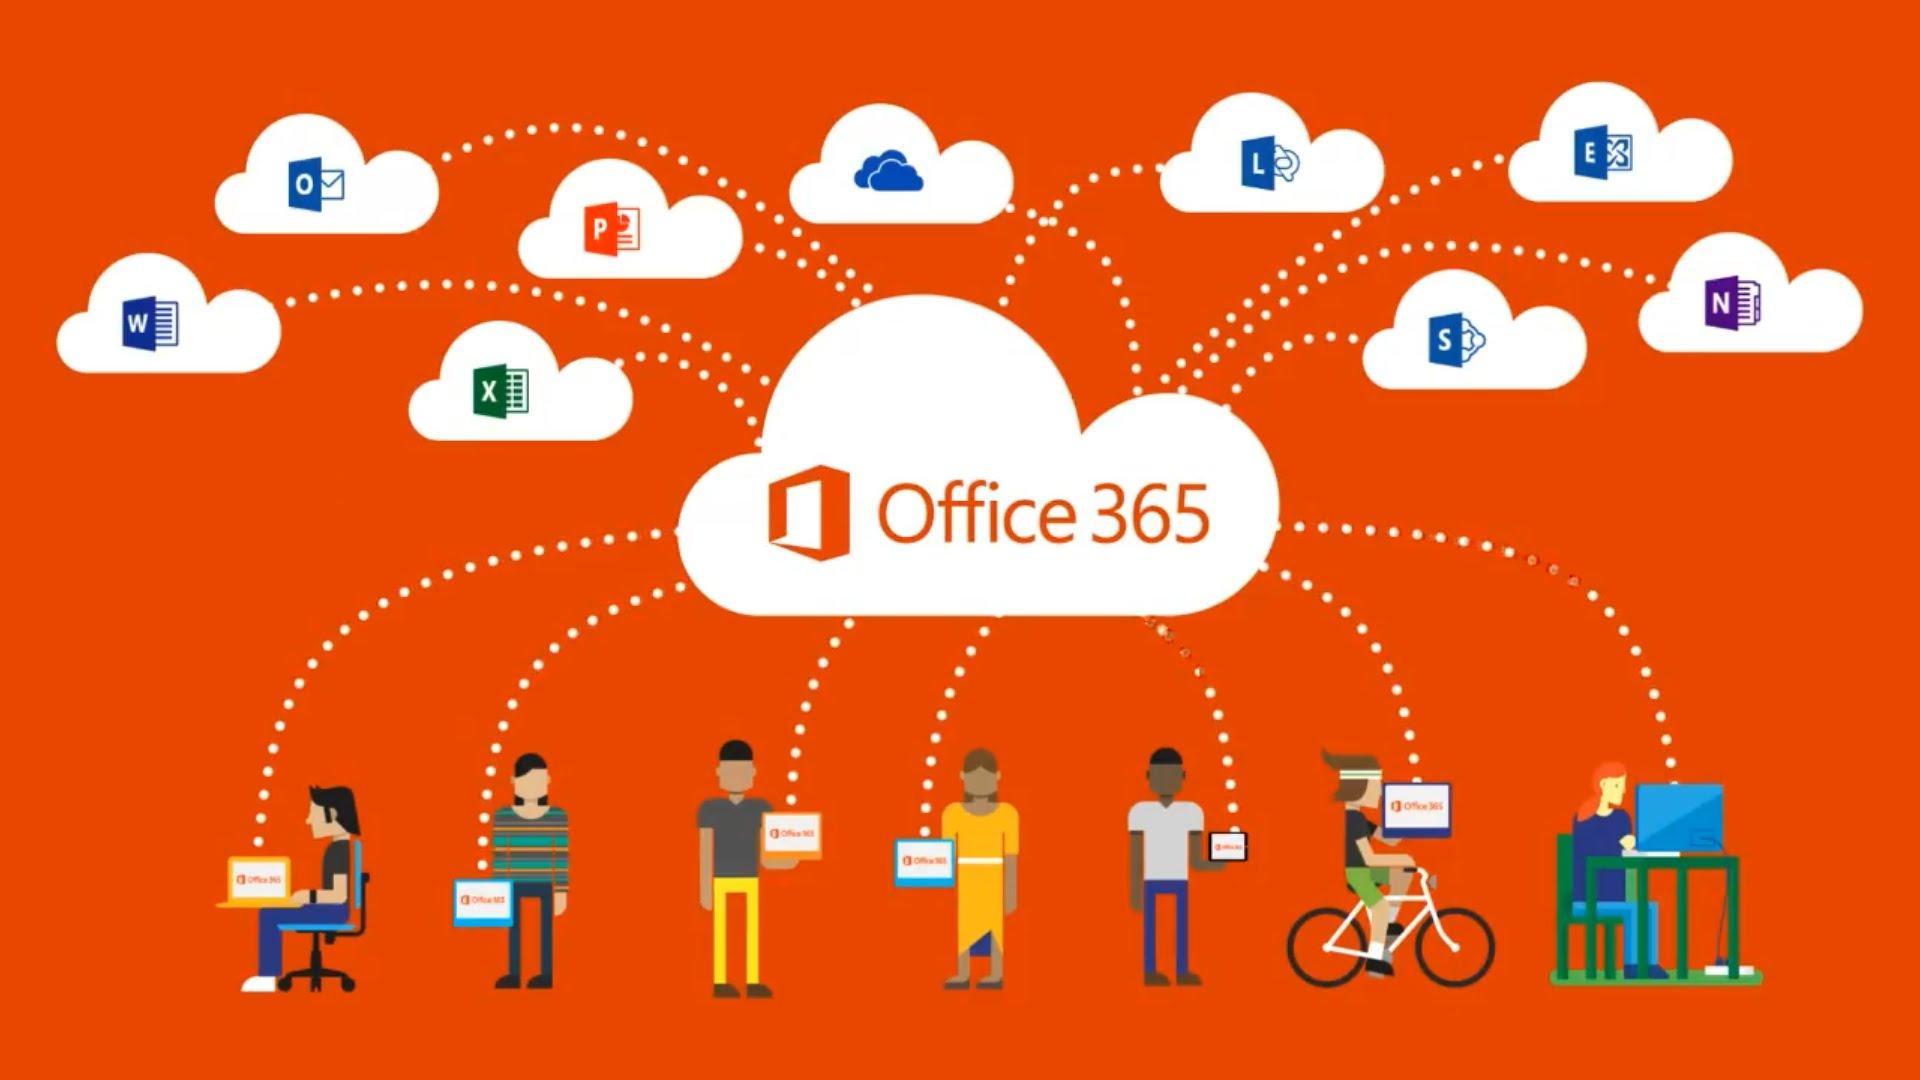 Review Microsoft Office 365: Microsoft's cloud-based collaborative suite - Appvizer